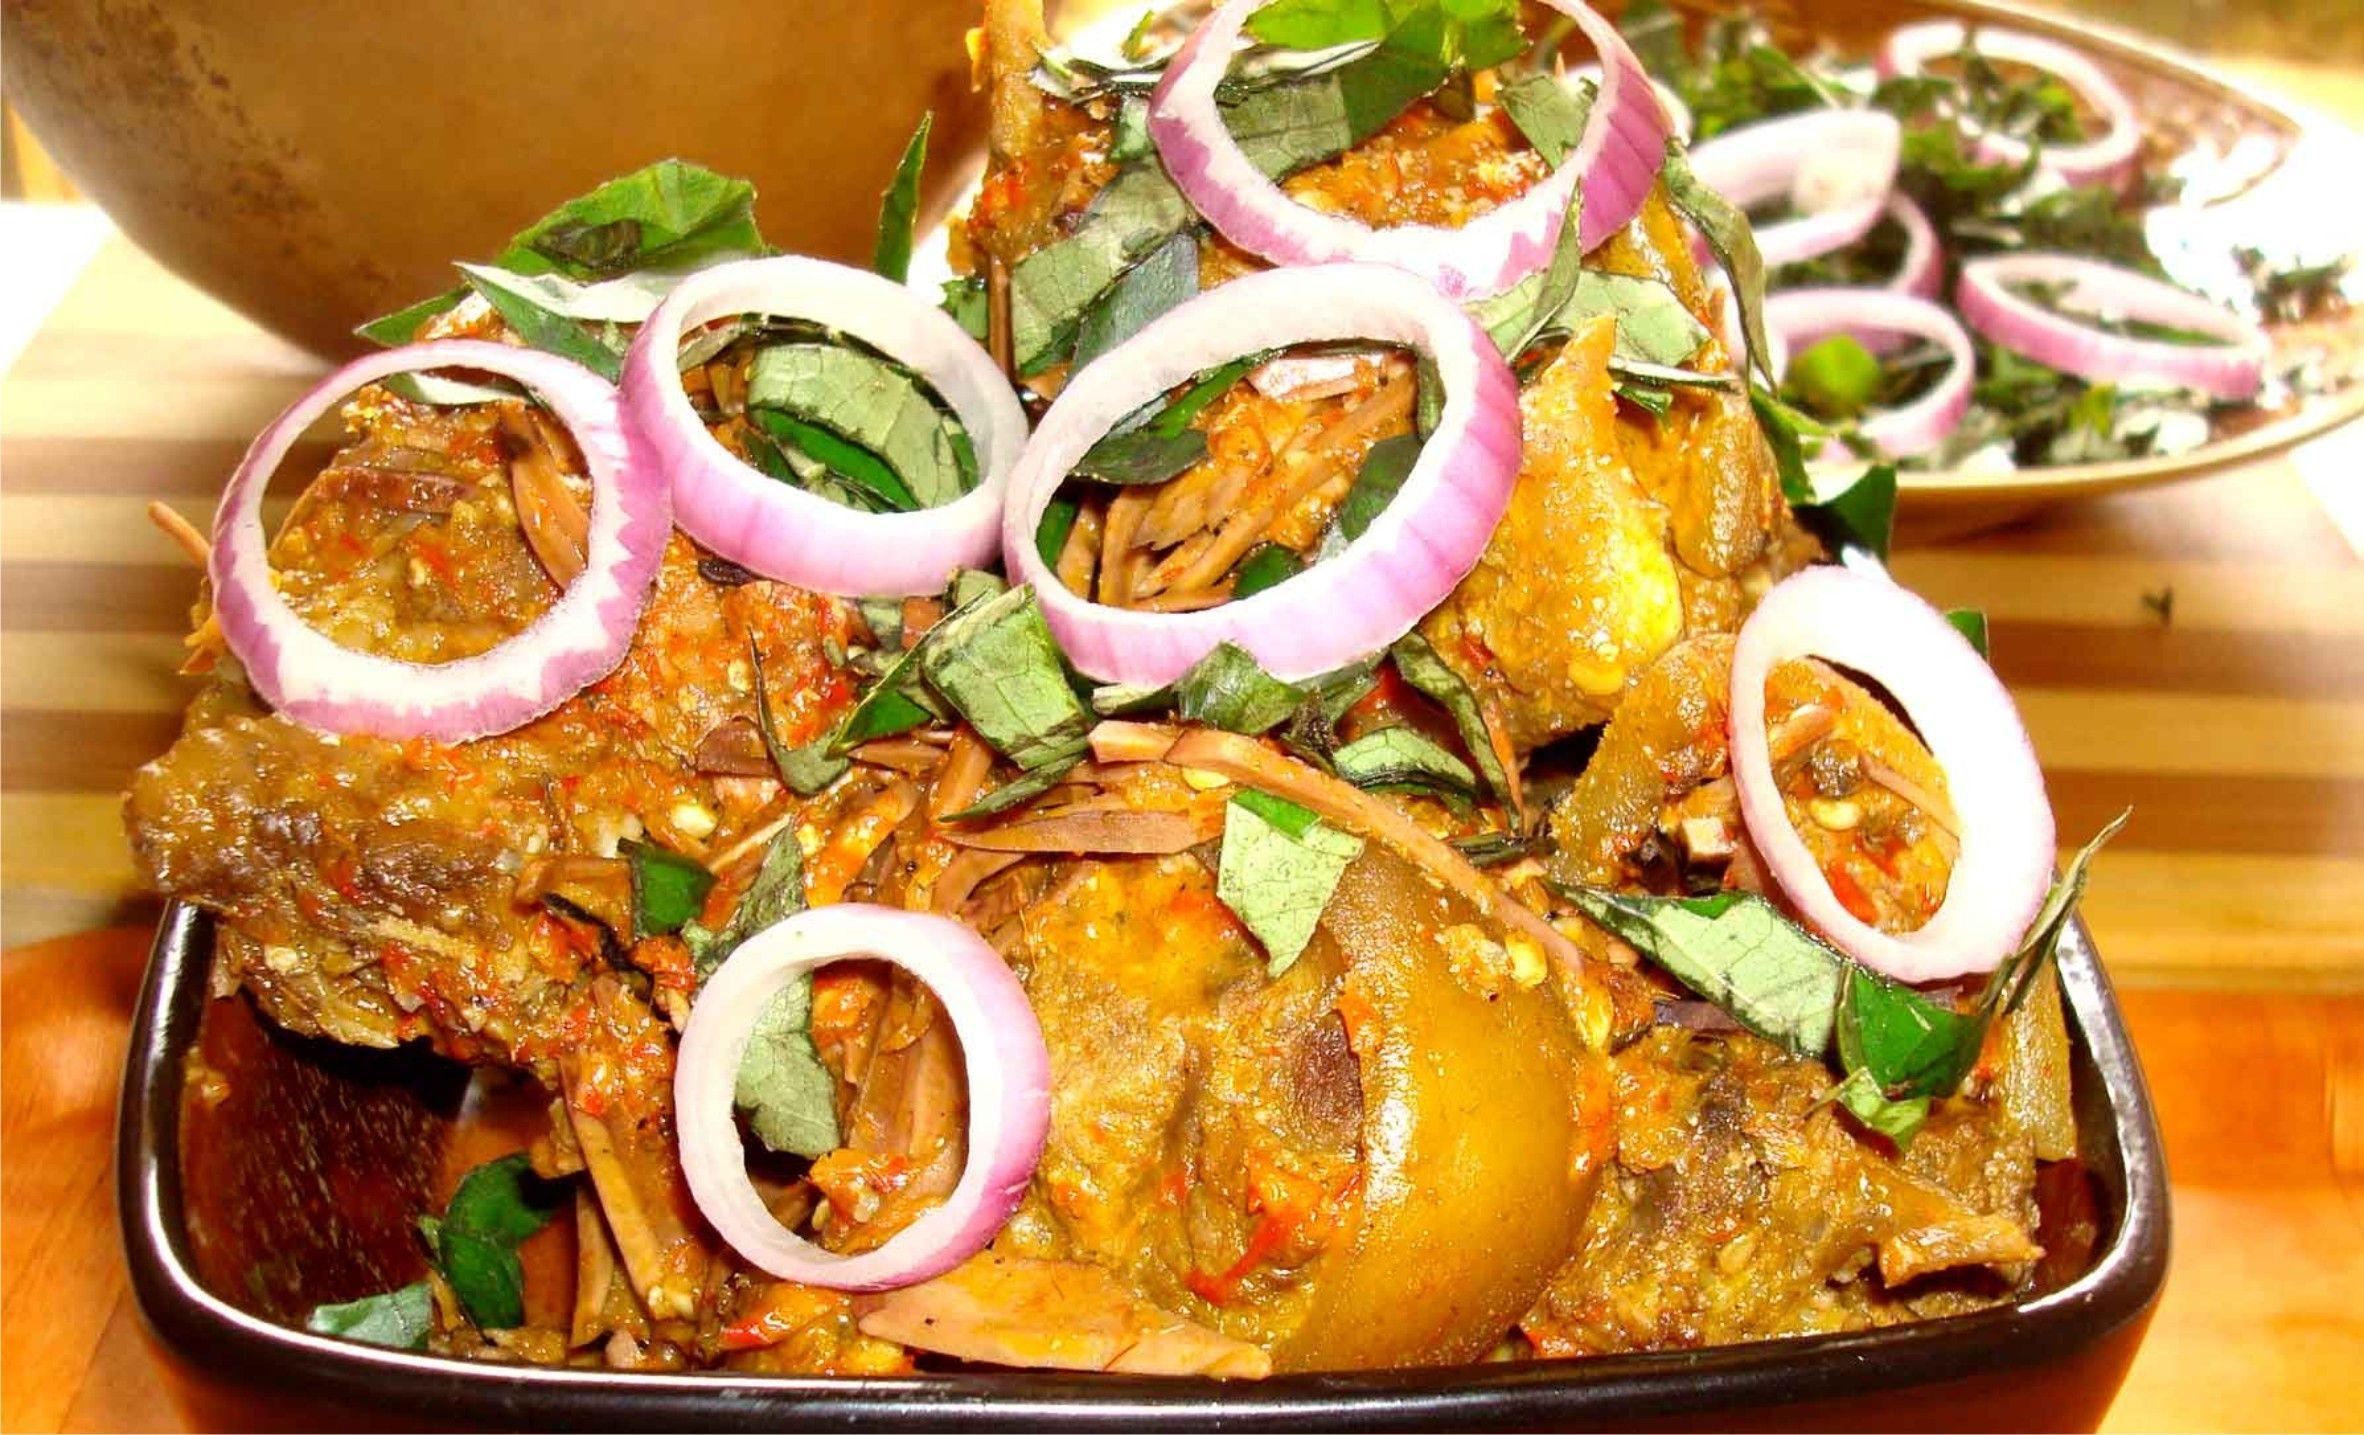 #NigerianSuya #NigerianFood #NigerianResturant #Nigerian #AfricanFood #Africa #Fads #AfricanCulture #EgusiSoup #Dodo